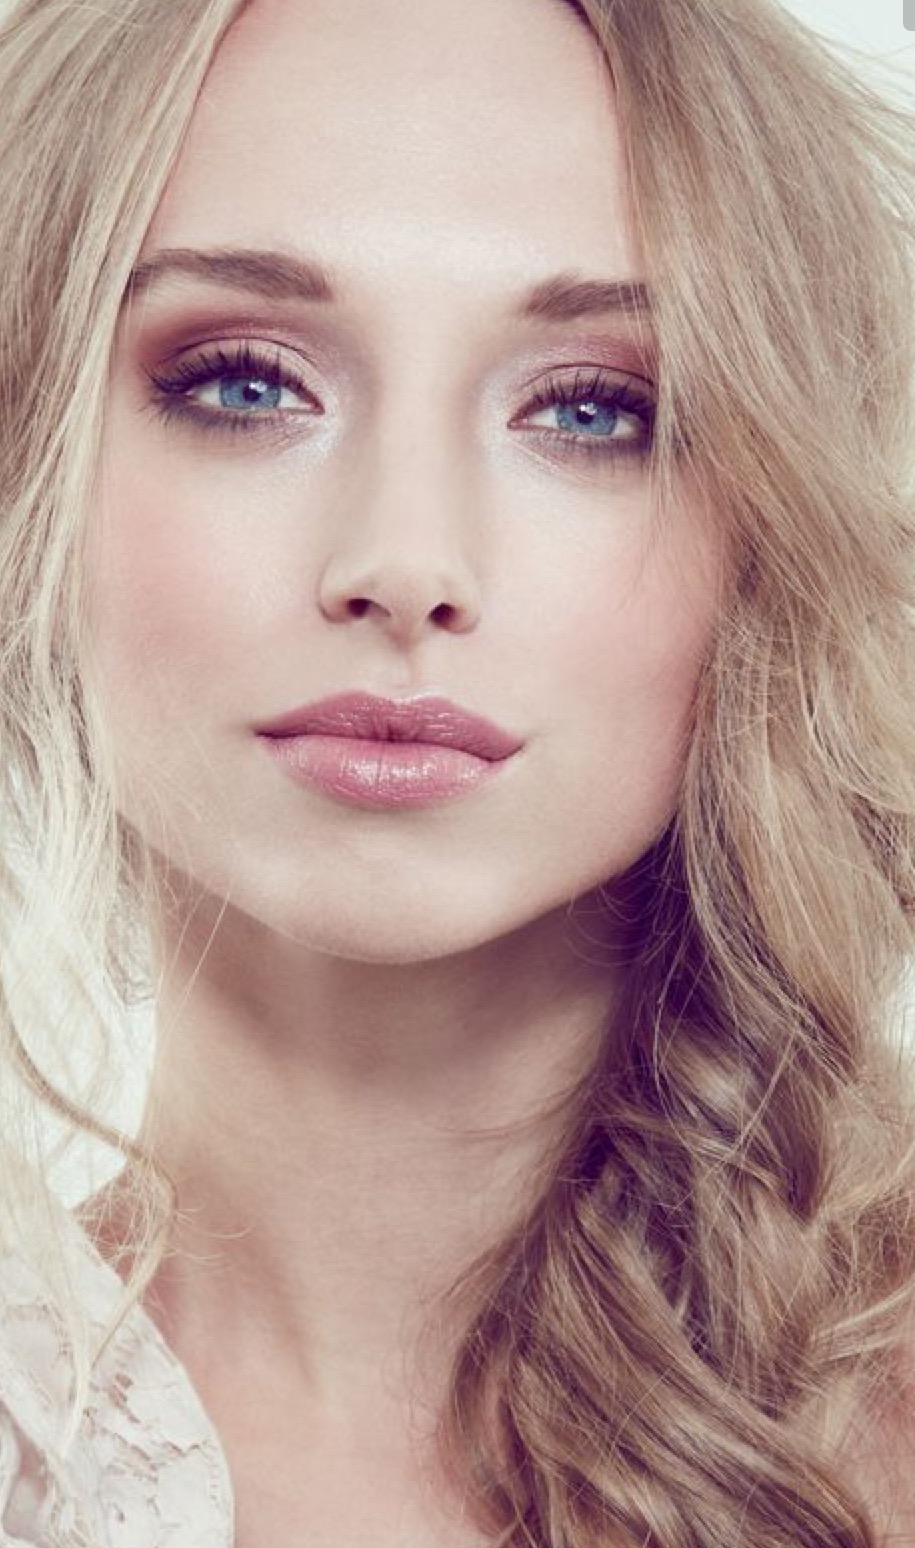 NIKI'S MAKE-UP BLOG: Prom Hair & Makeup Inspiration